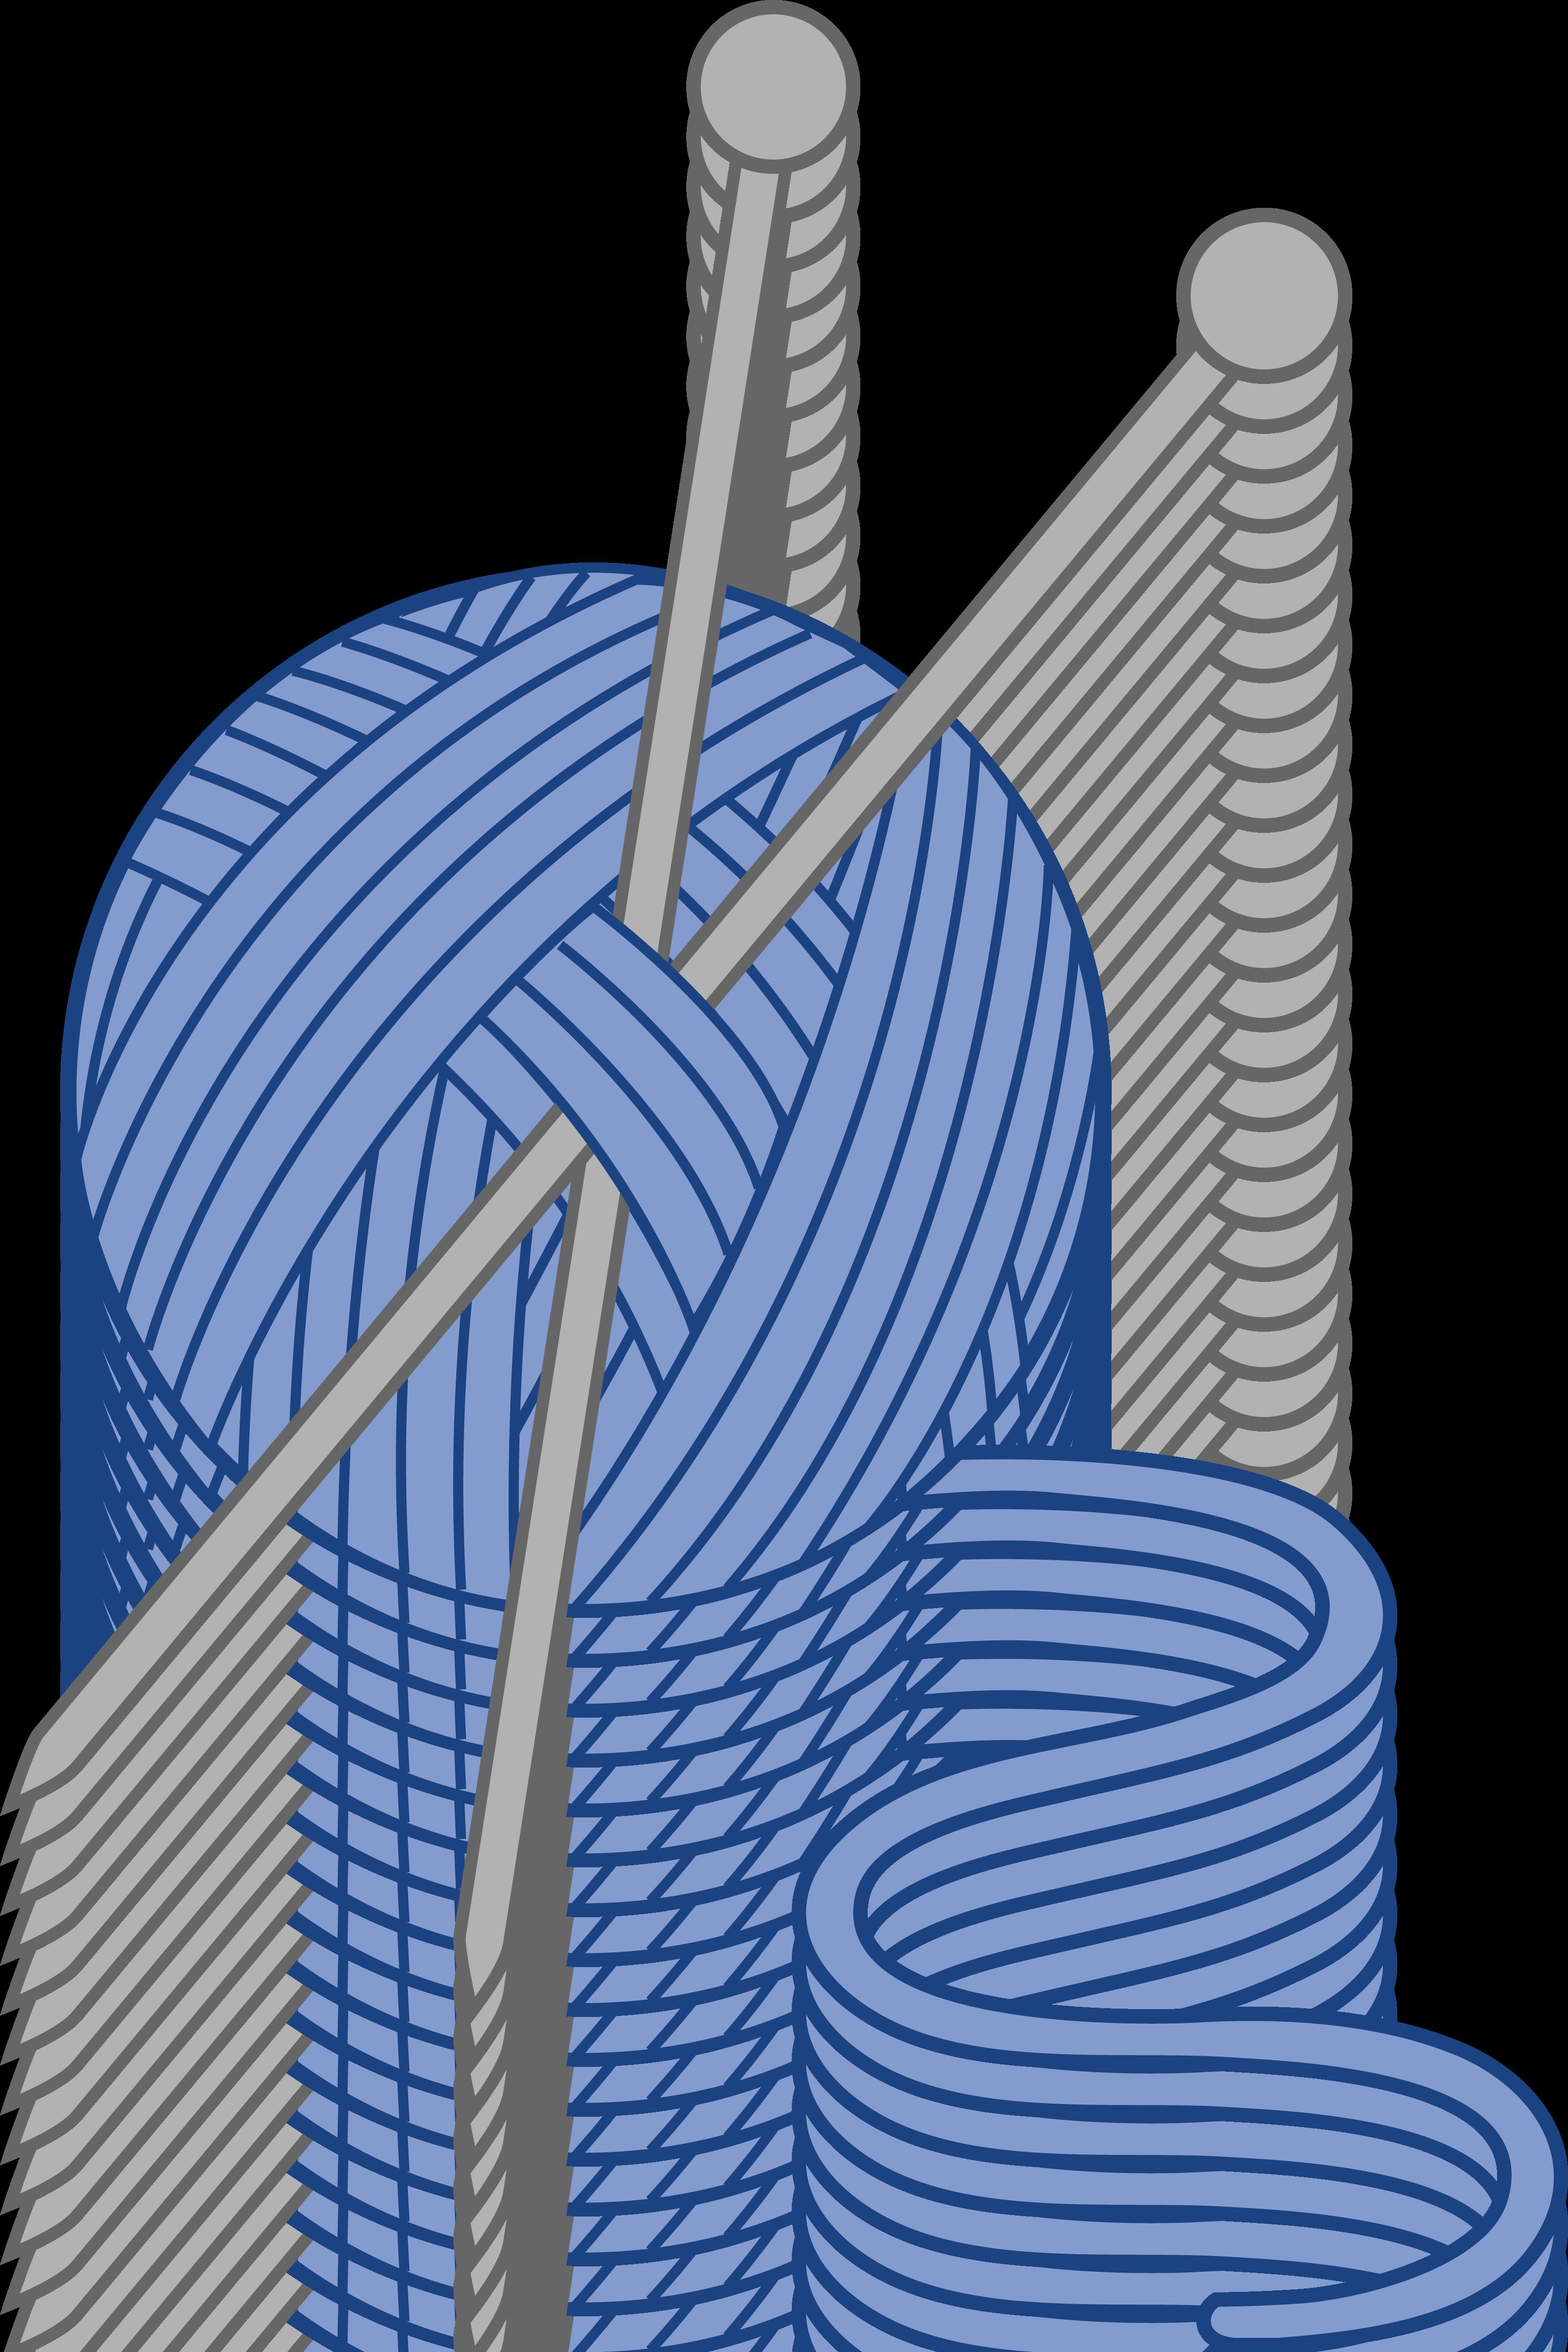 3206x4809 Blue Yarn And Knitting Needles